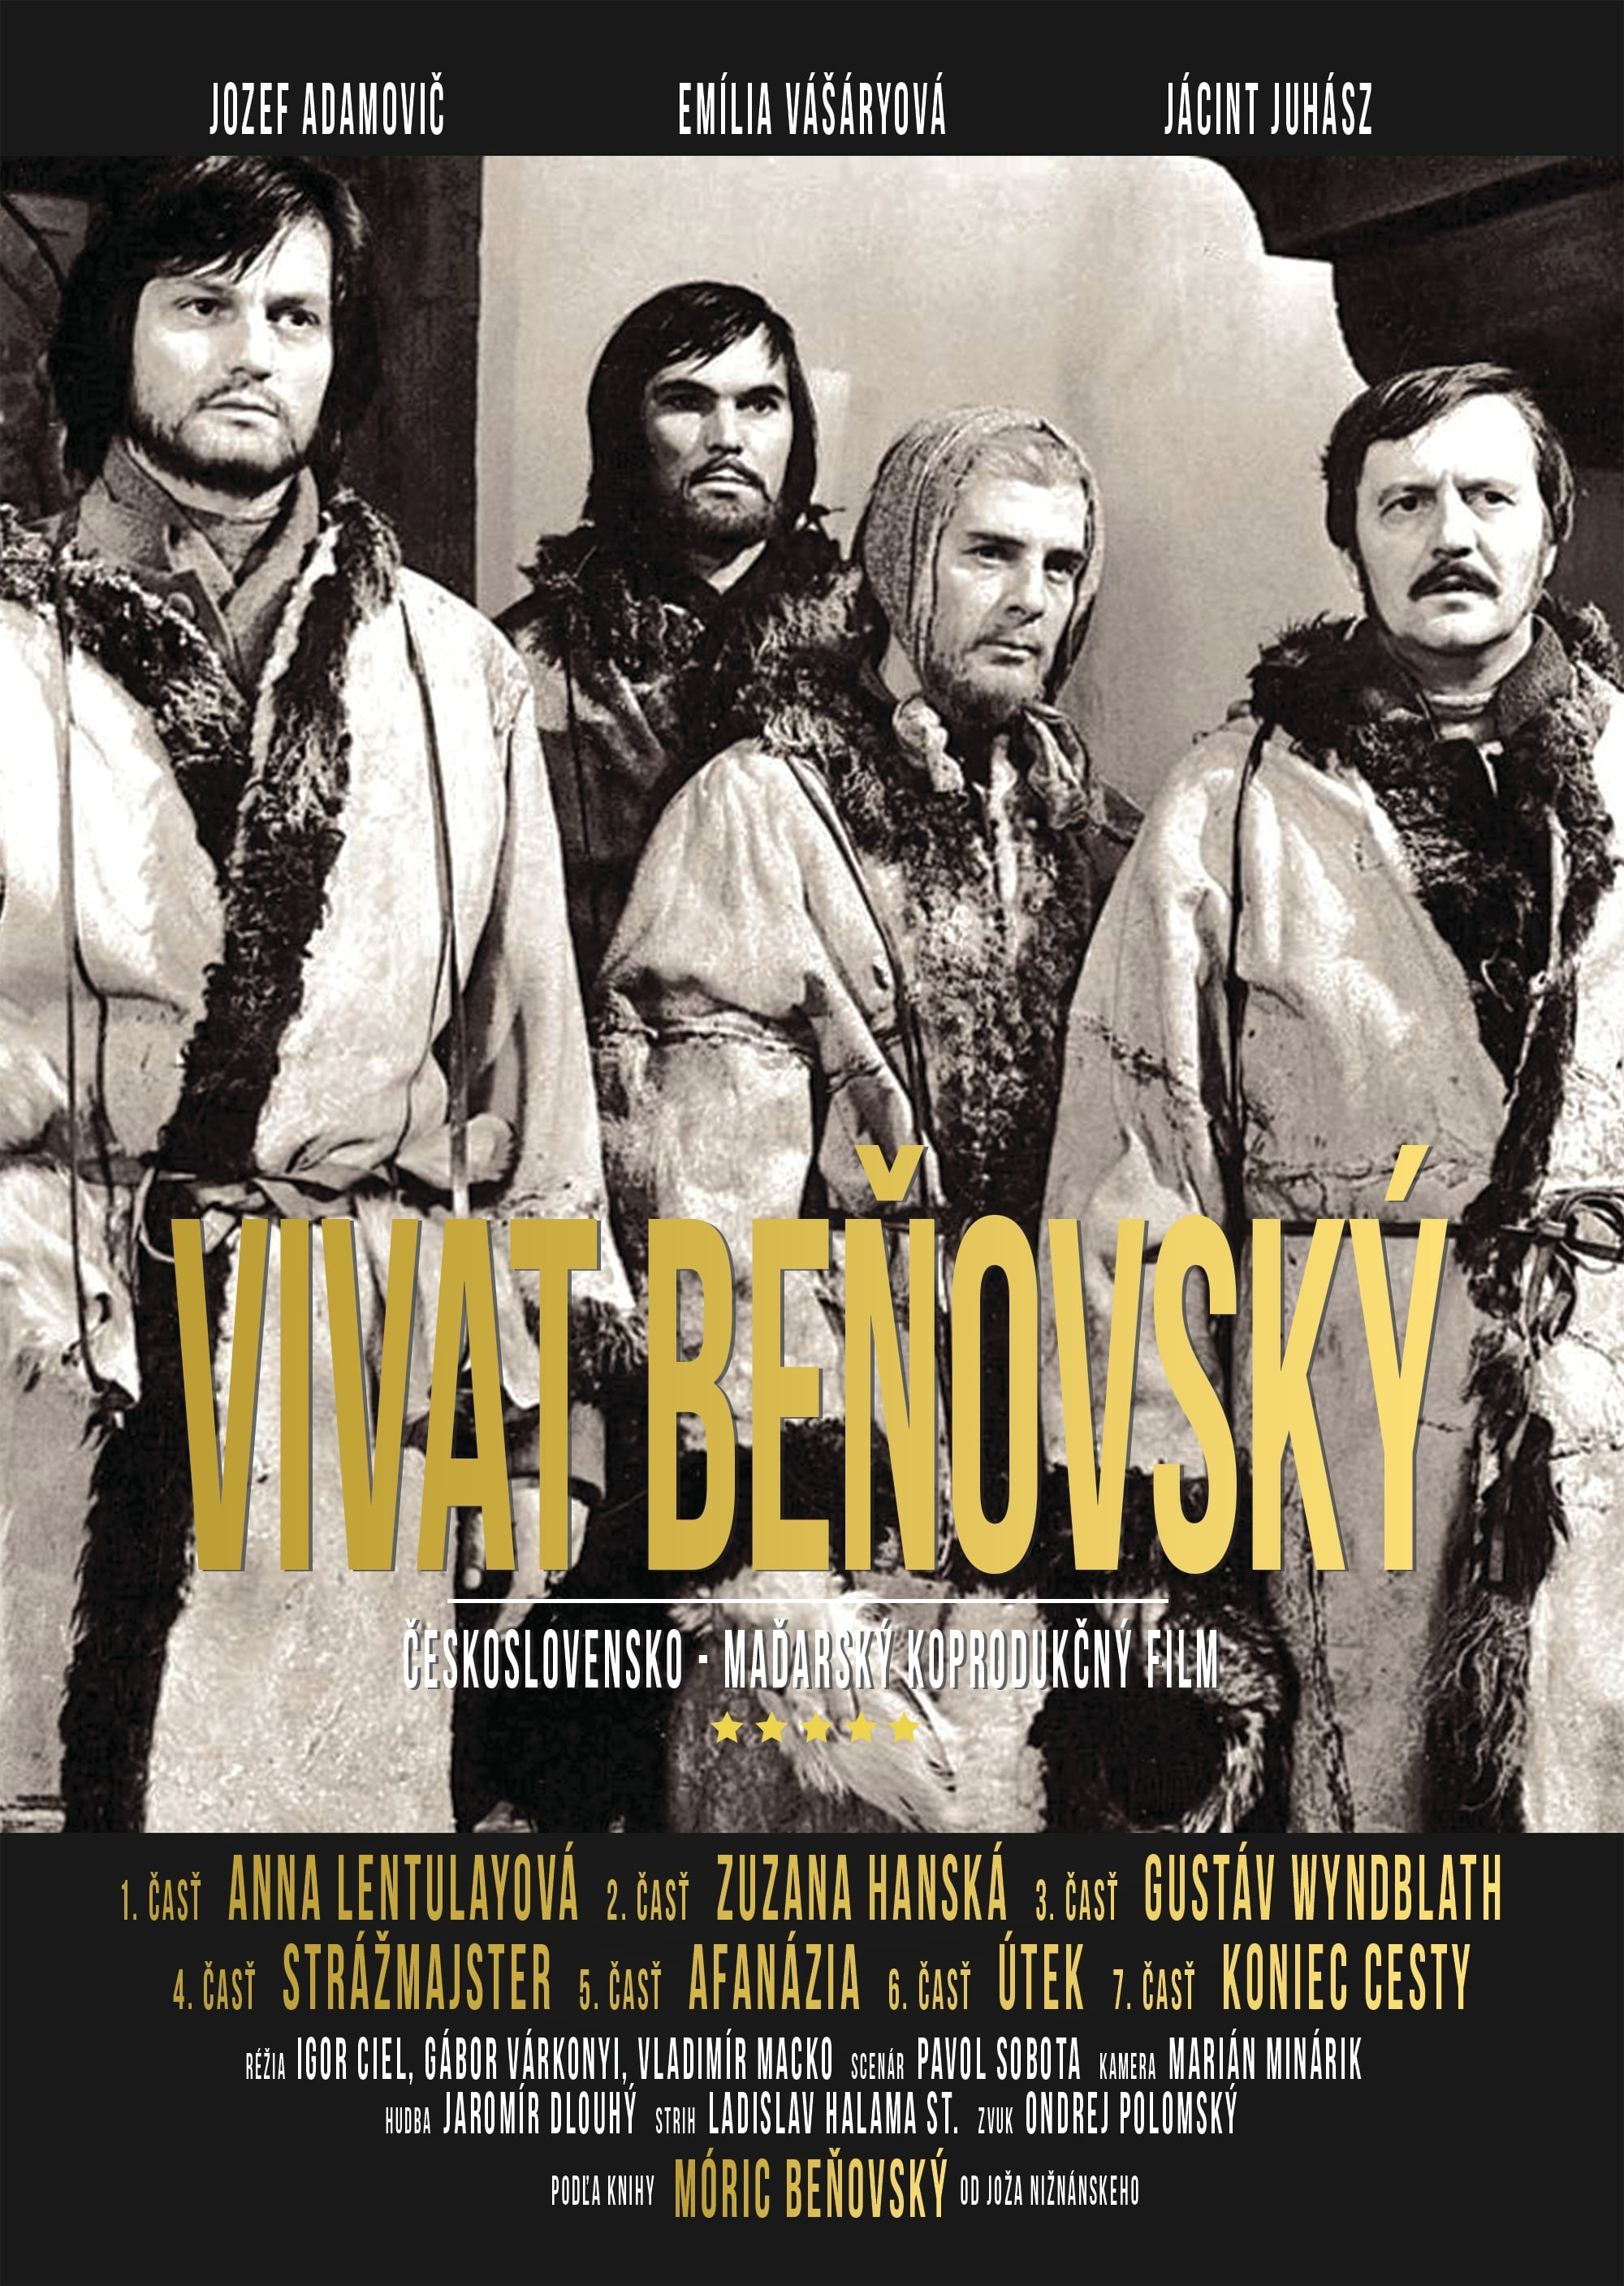 Vivat Beňovský! TV Shows About Adventurer